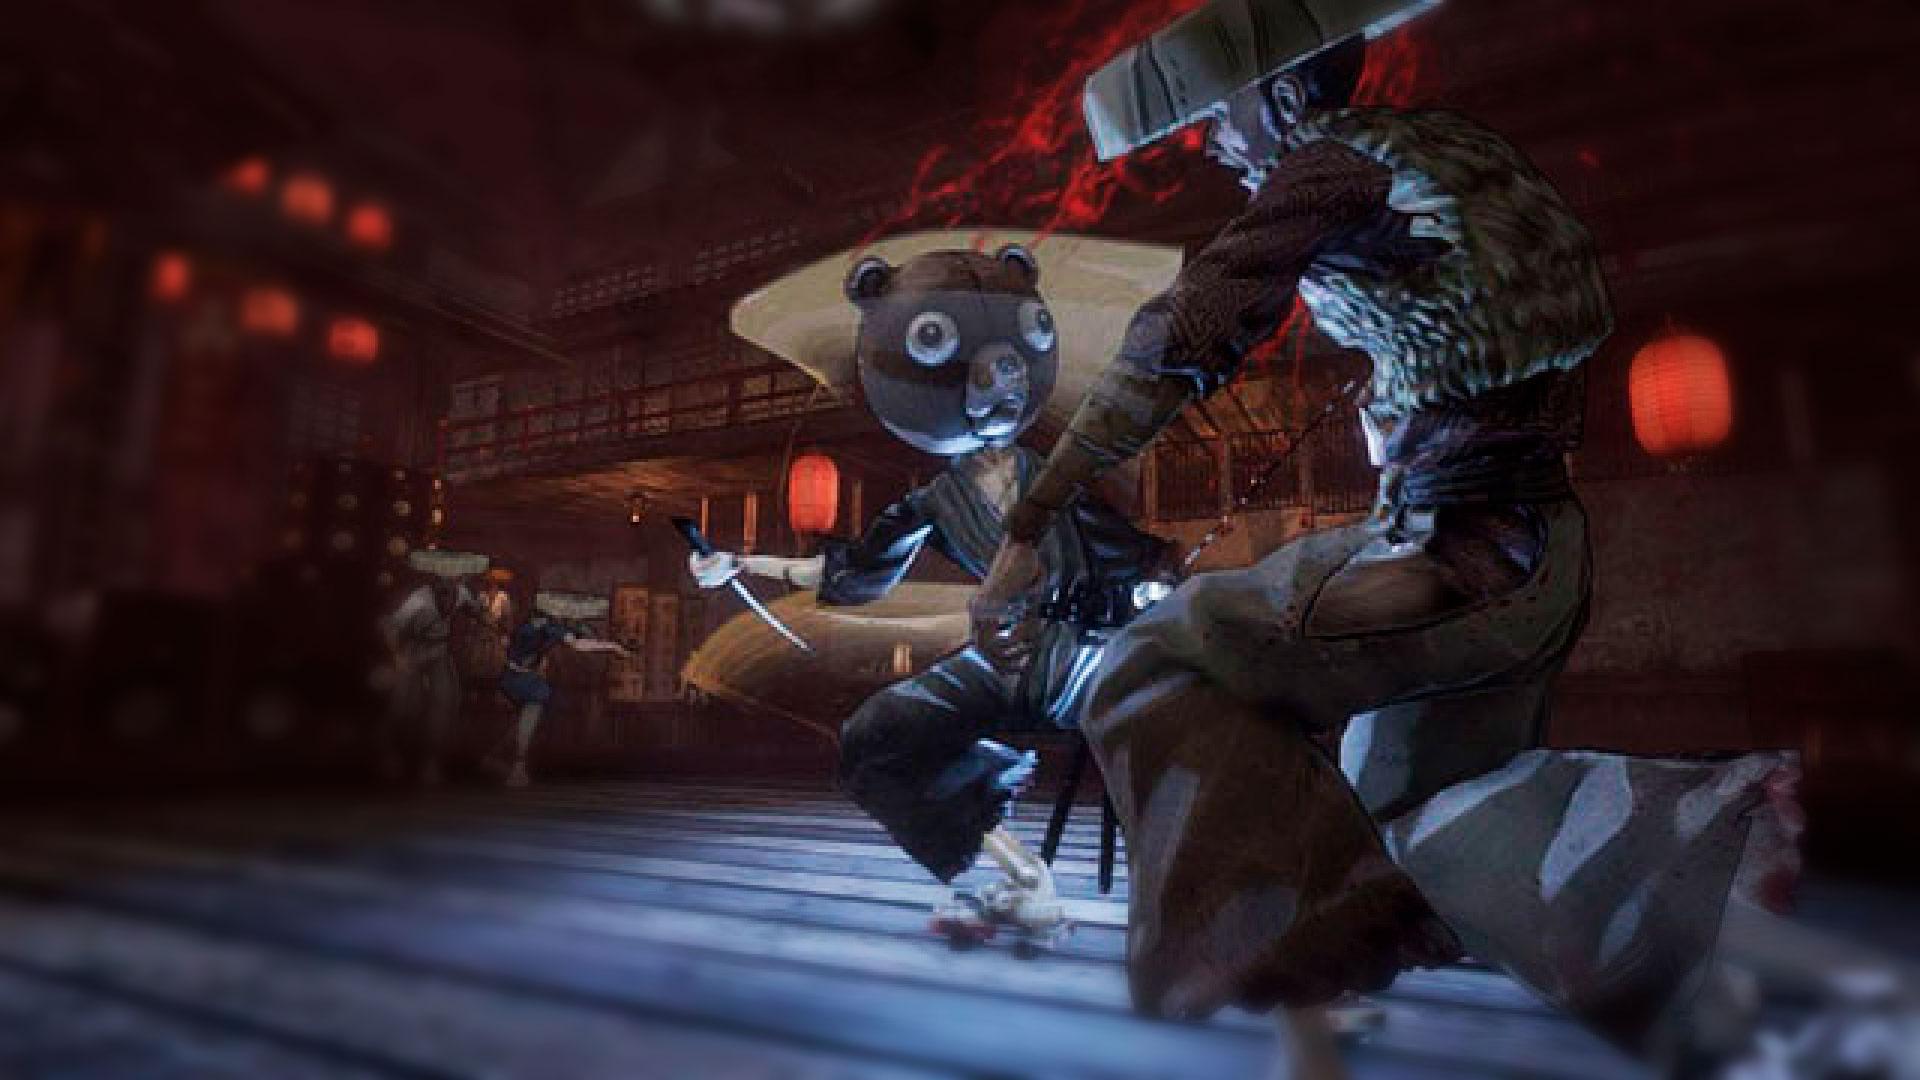 Afro Samurai 2 Revenge of Kuma худший файтинг в истории